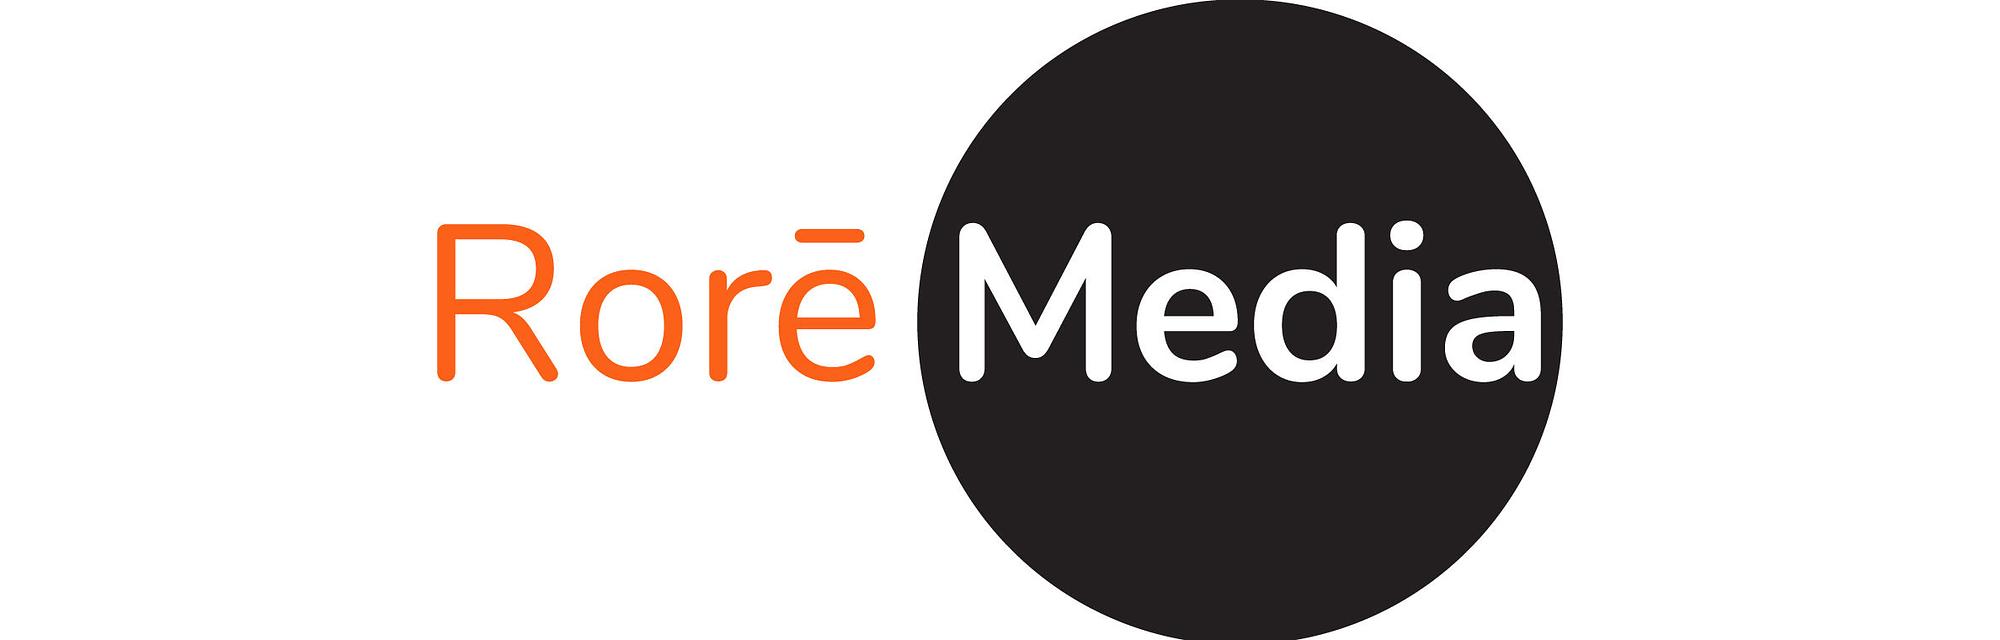 Rore Media